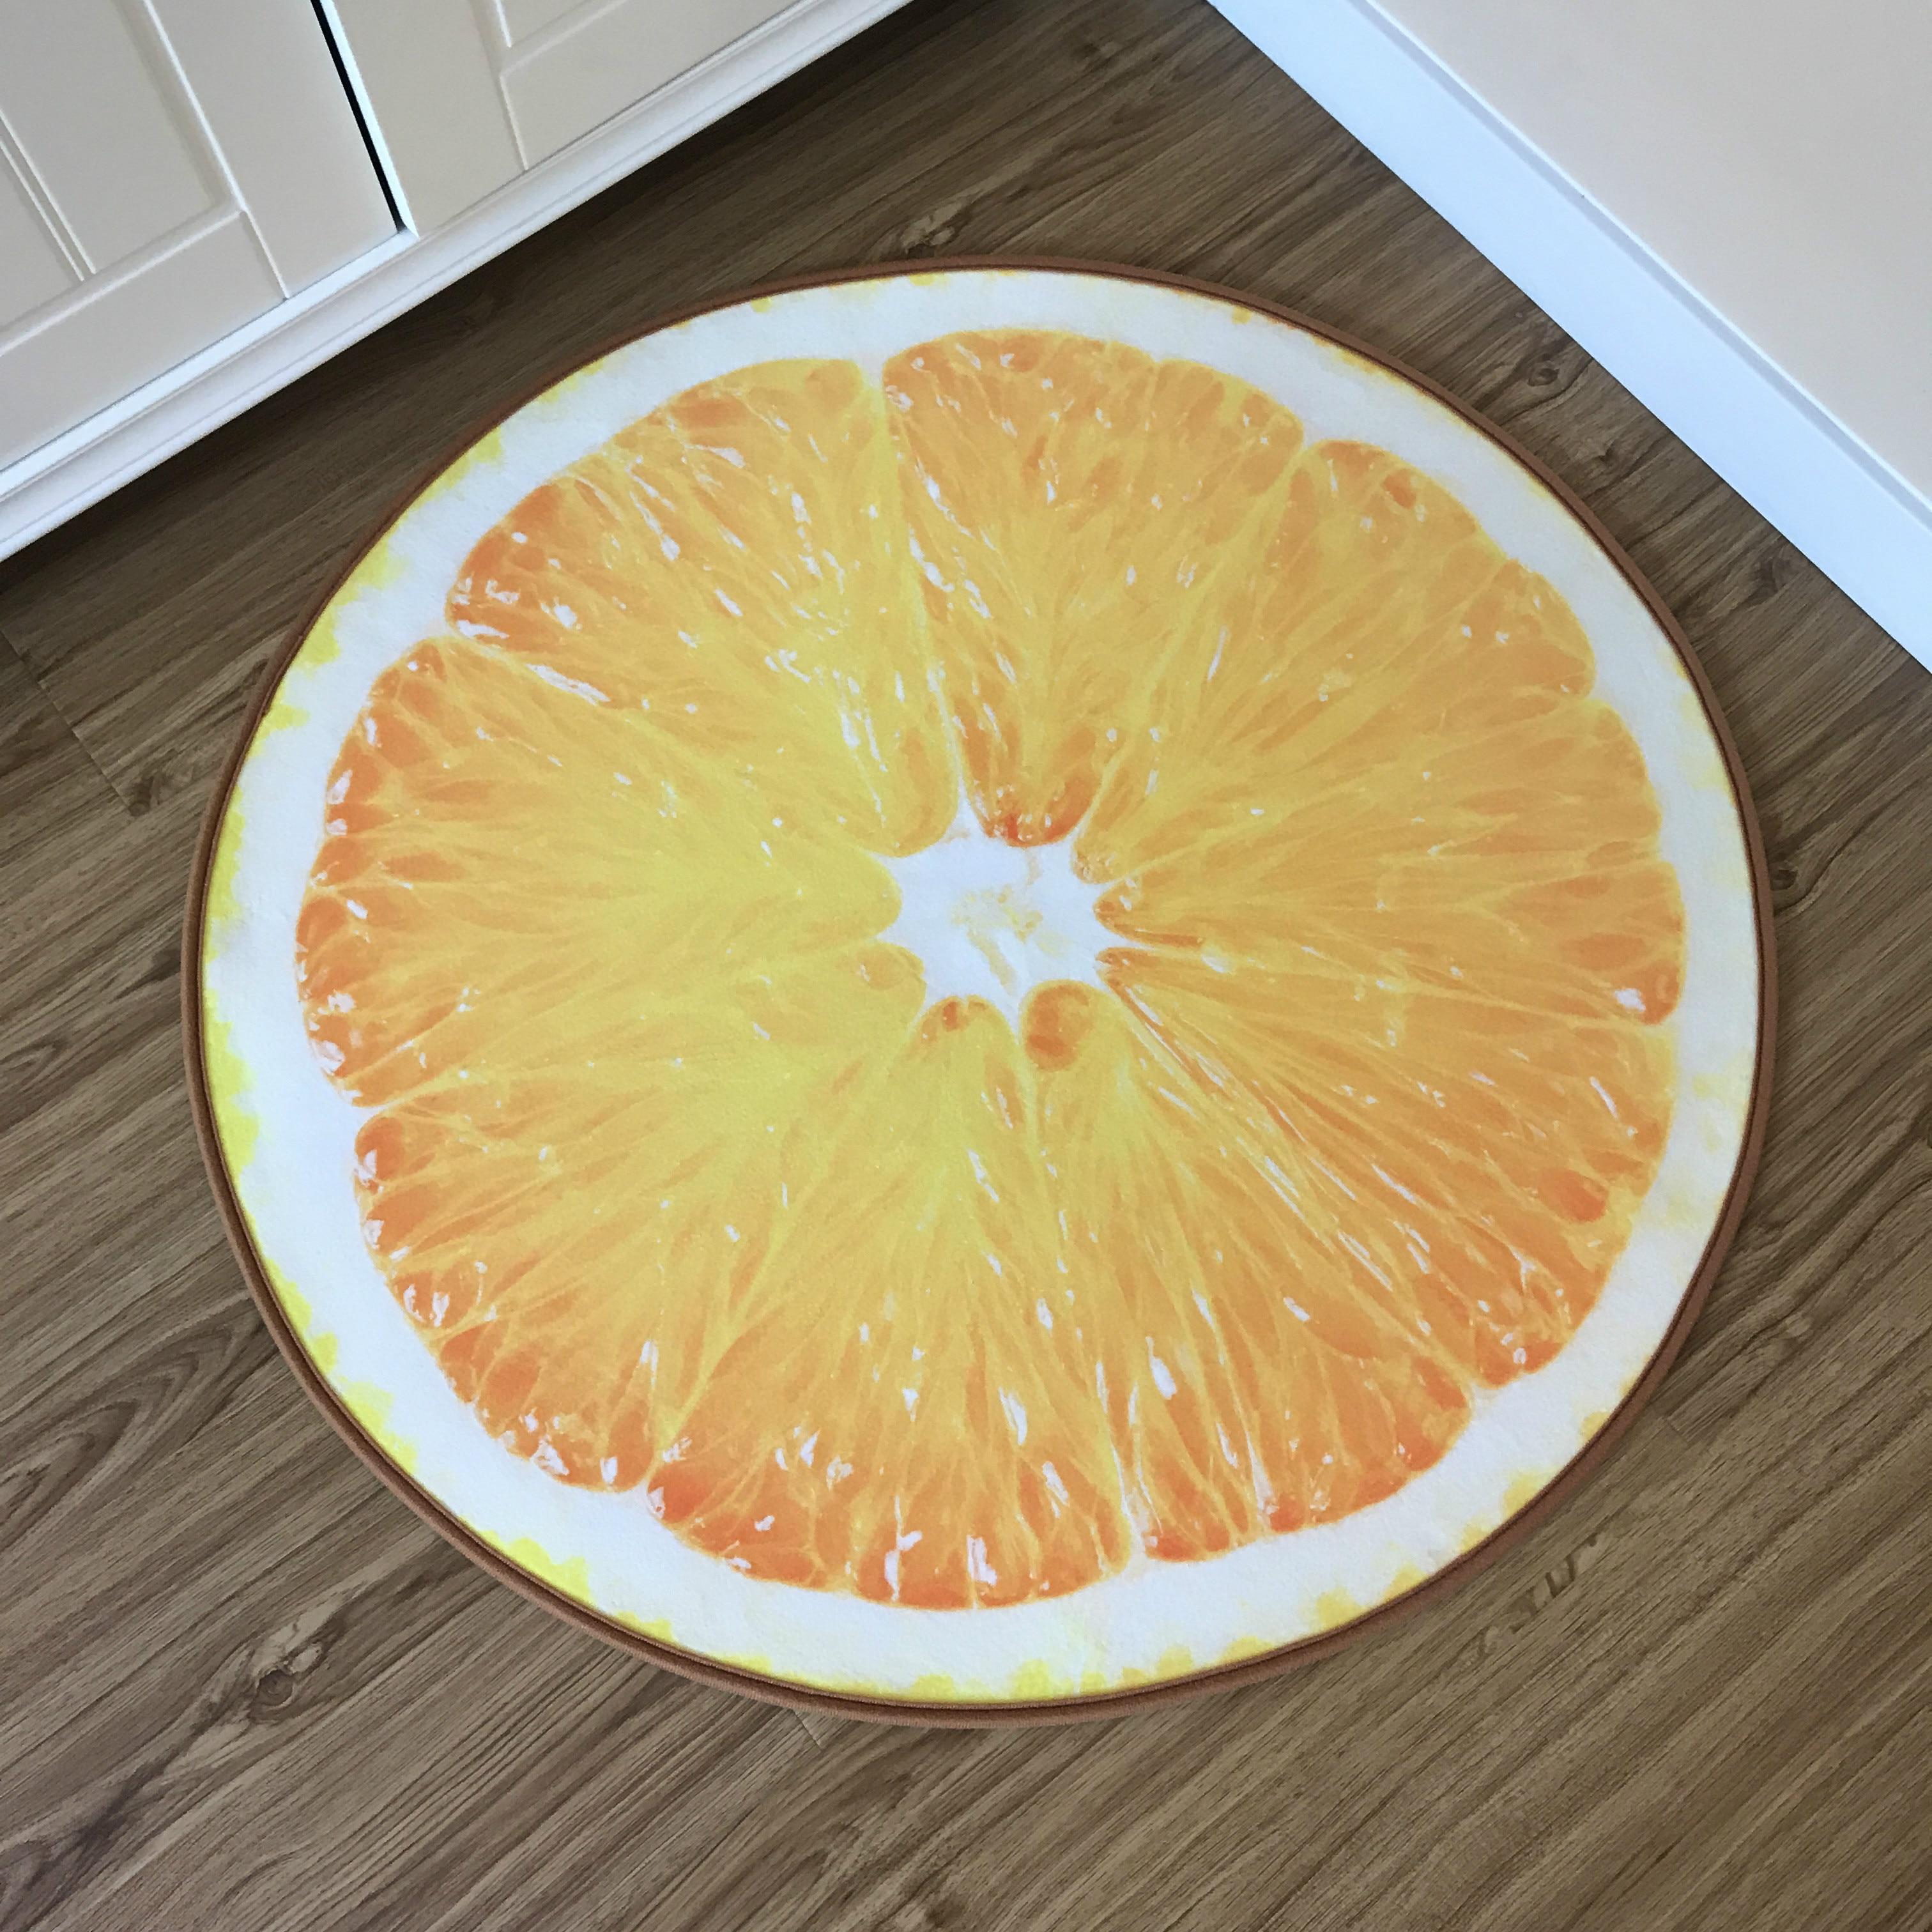 Round Carpet Fruit 3D Print Soft Carpets Anti-slip Rugs Computer Chair Mat Kiwi Watermelon Floor Mat for Kids Room Home Decor